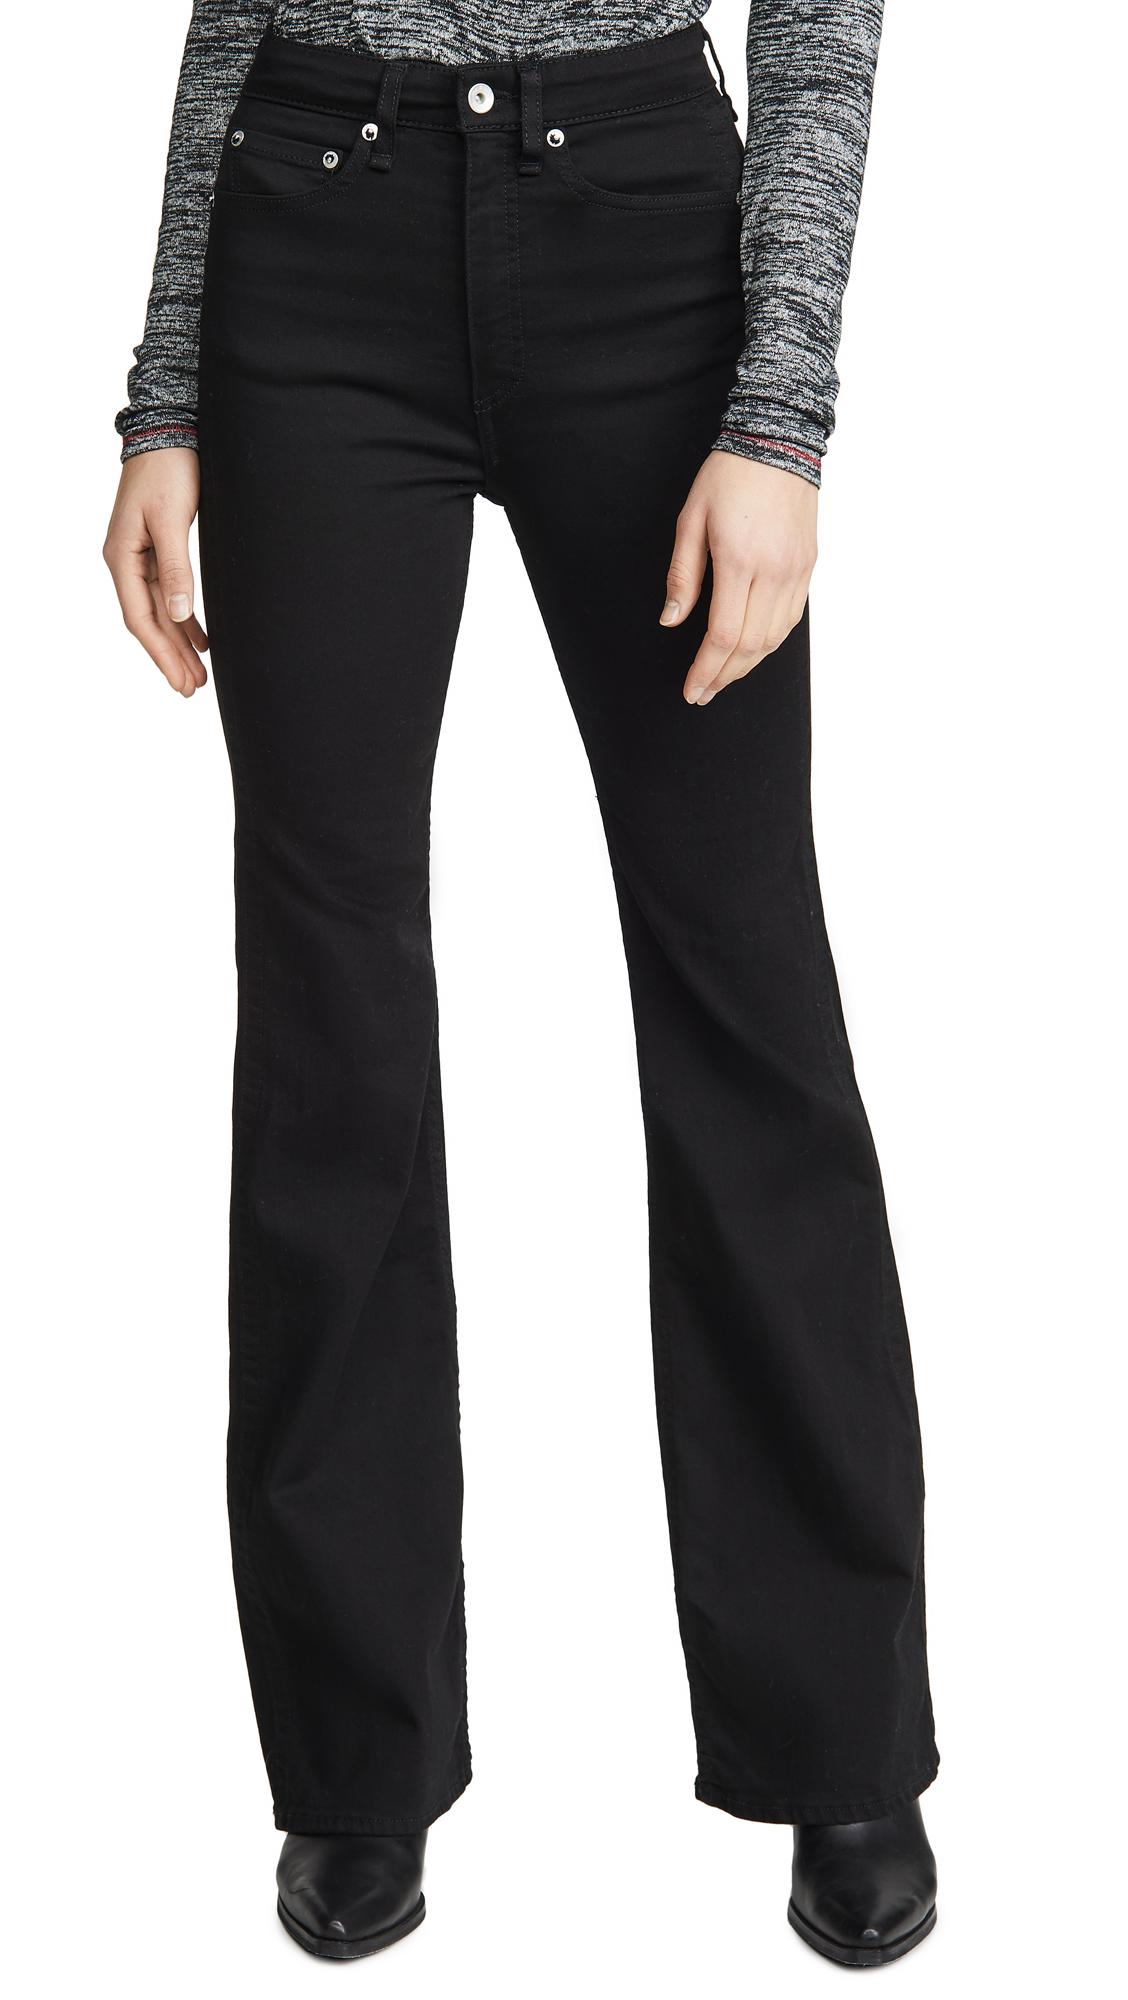 Buy Rag & Bone/JEAN online - photo of Rag & Bone/JEAN Jane Super High-Rise Flare Jeans